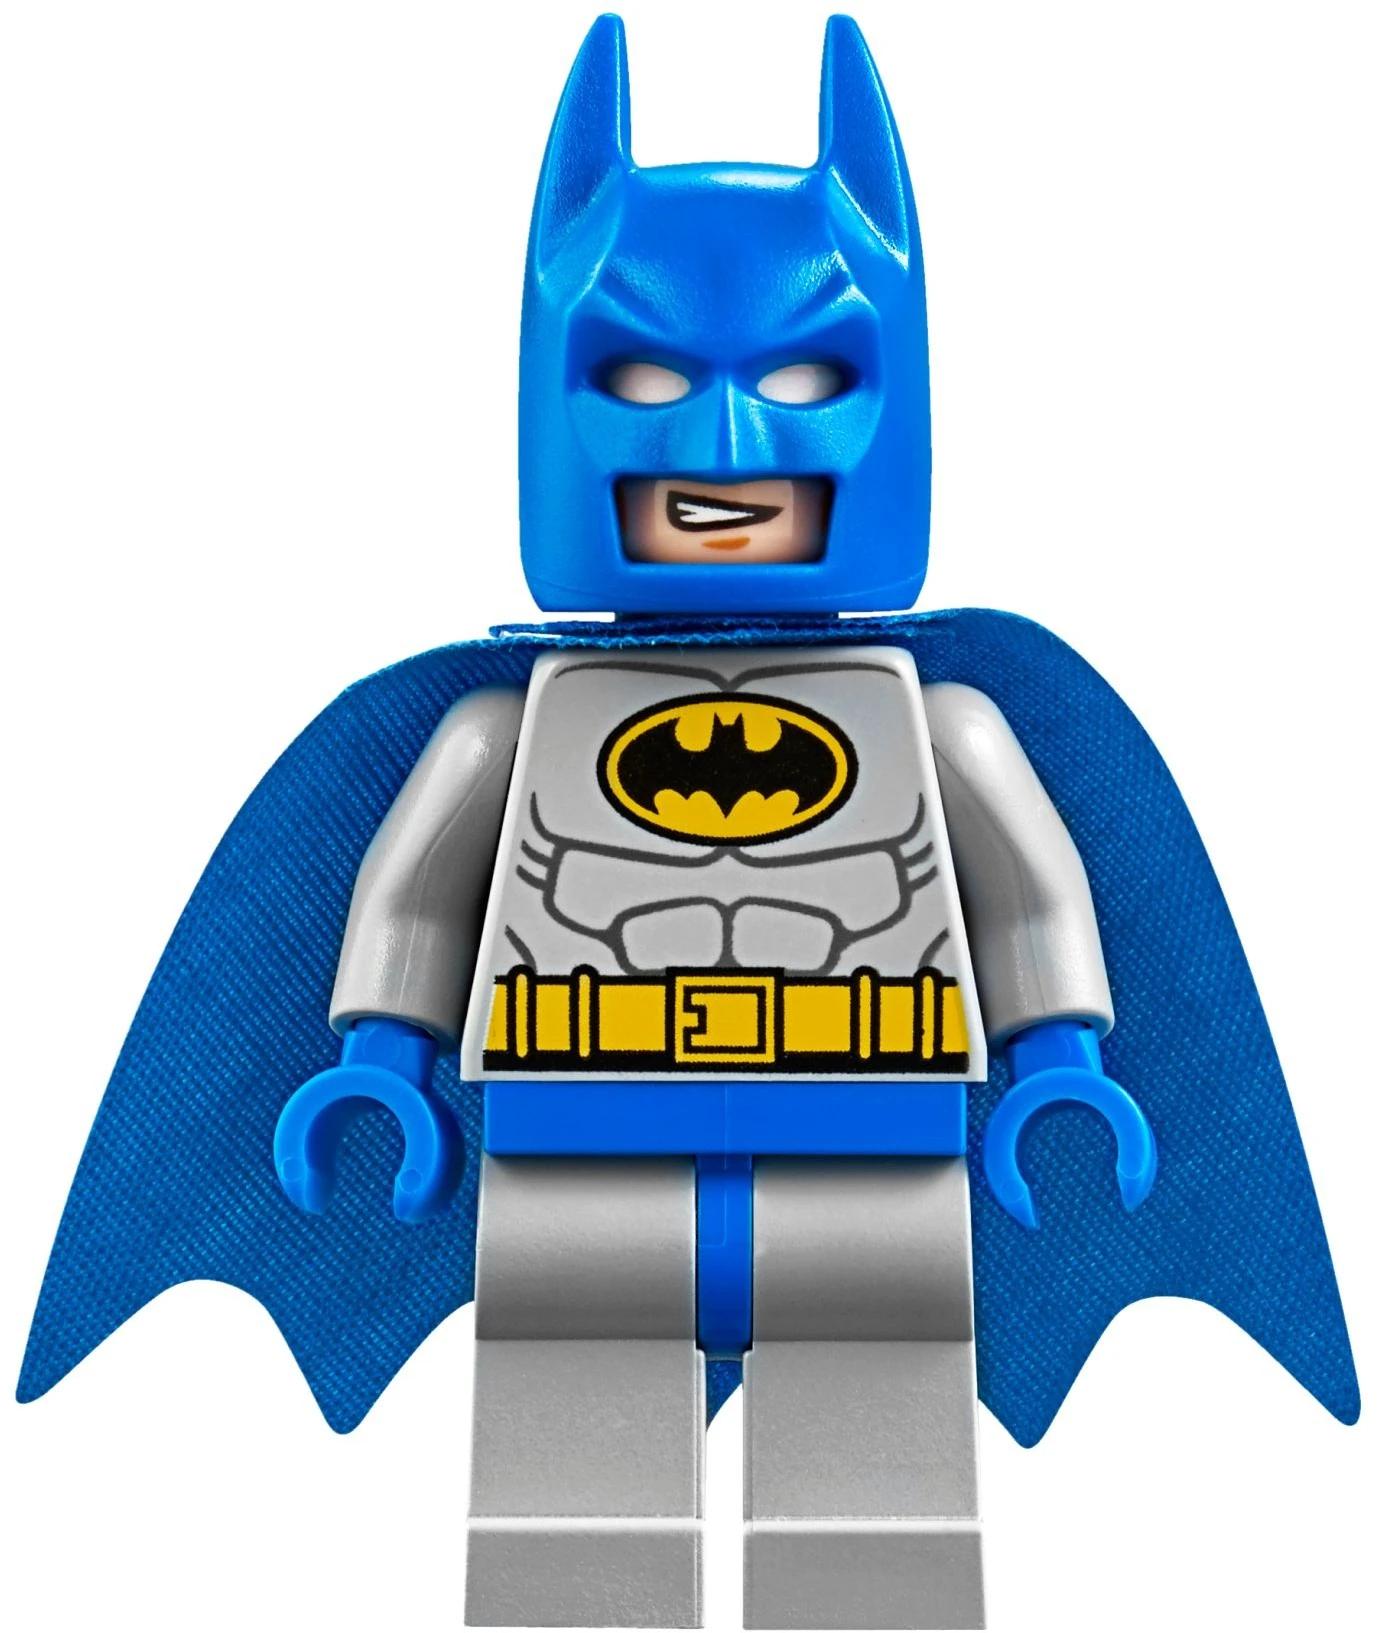 10672 Batman: Defend the Batcave - Brickipedia, the LEGO Wiki